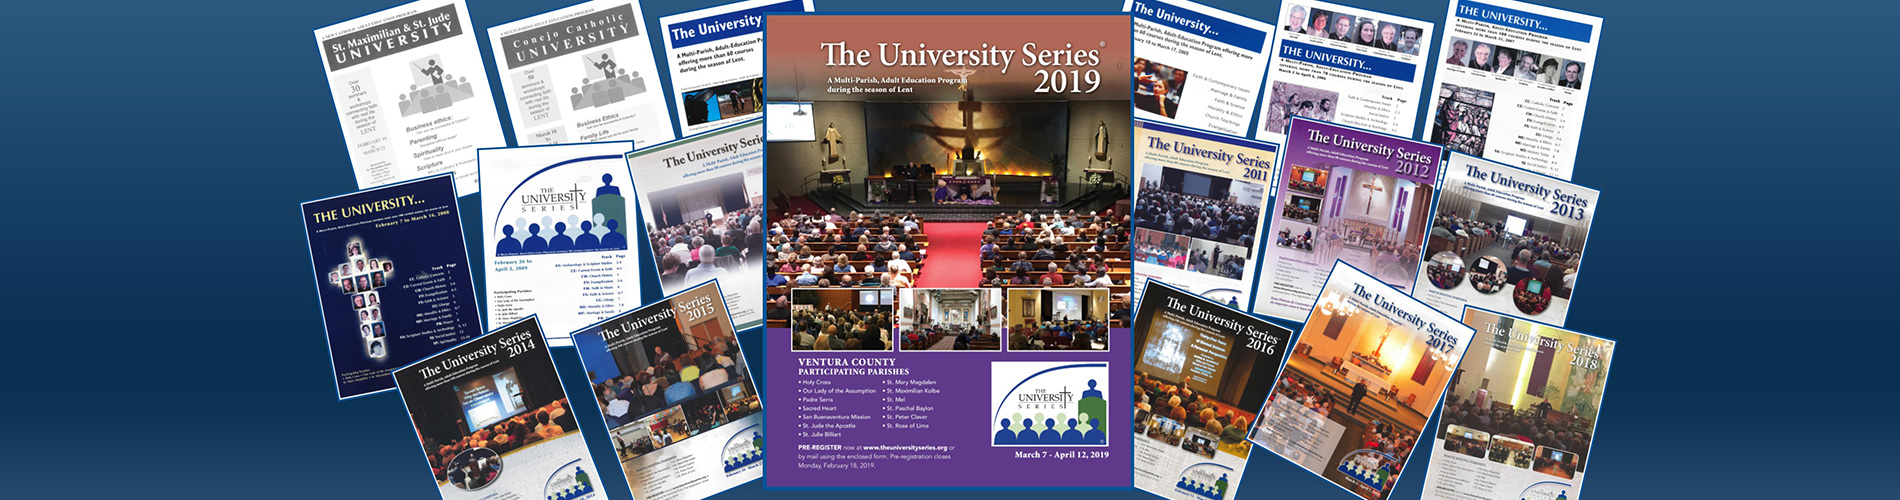 The University Series 2019